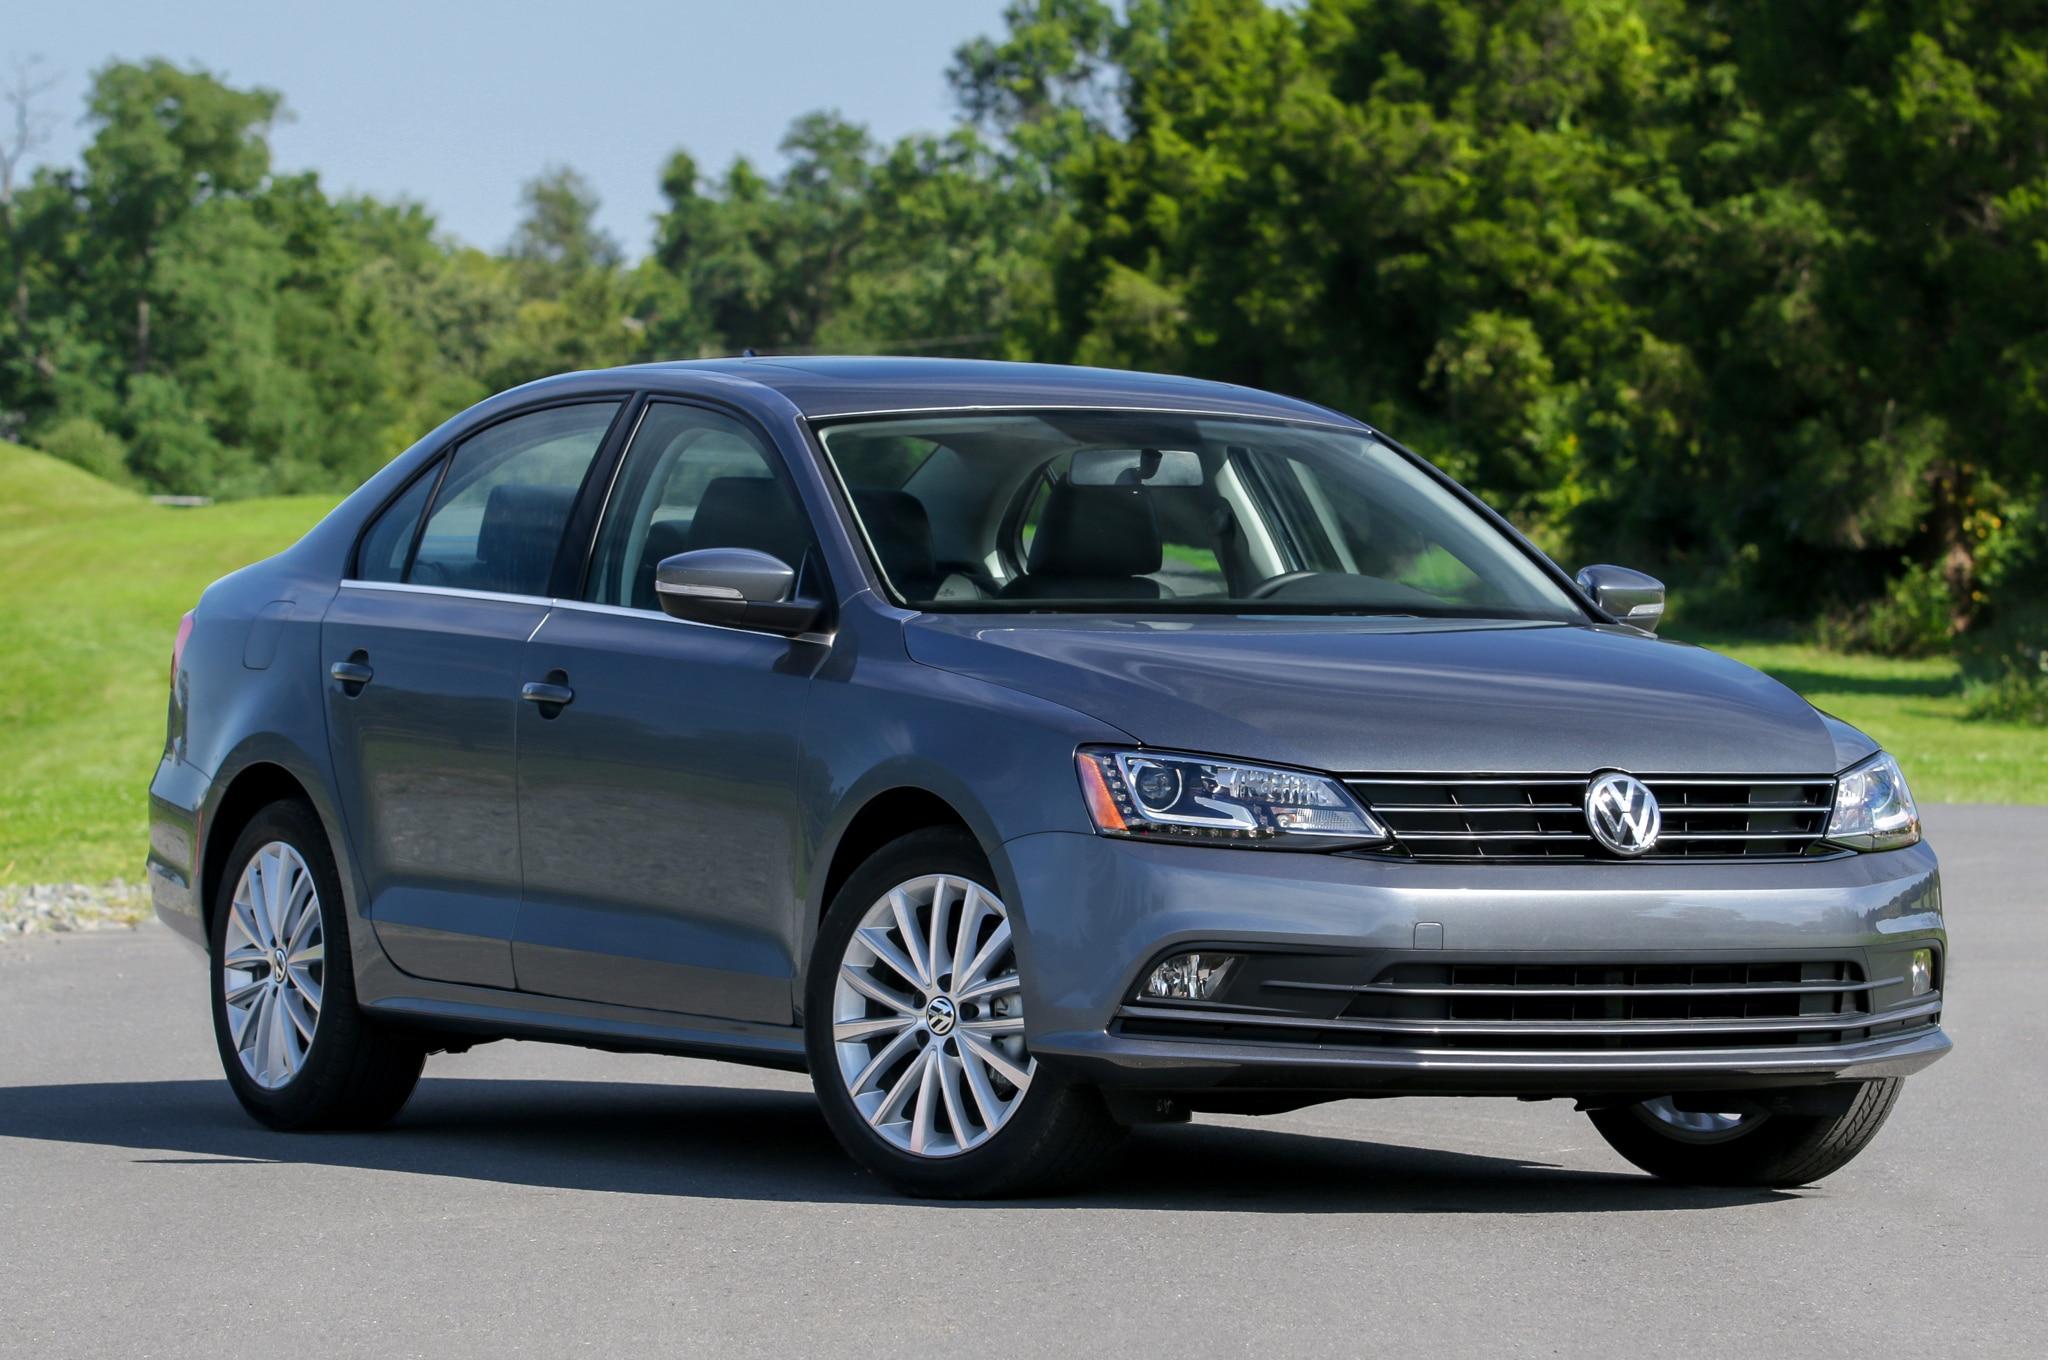 photos research jetta ca price options volkswagen reviews trims specs interior autotrader